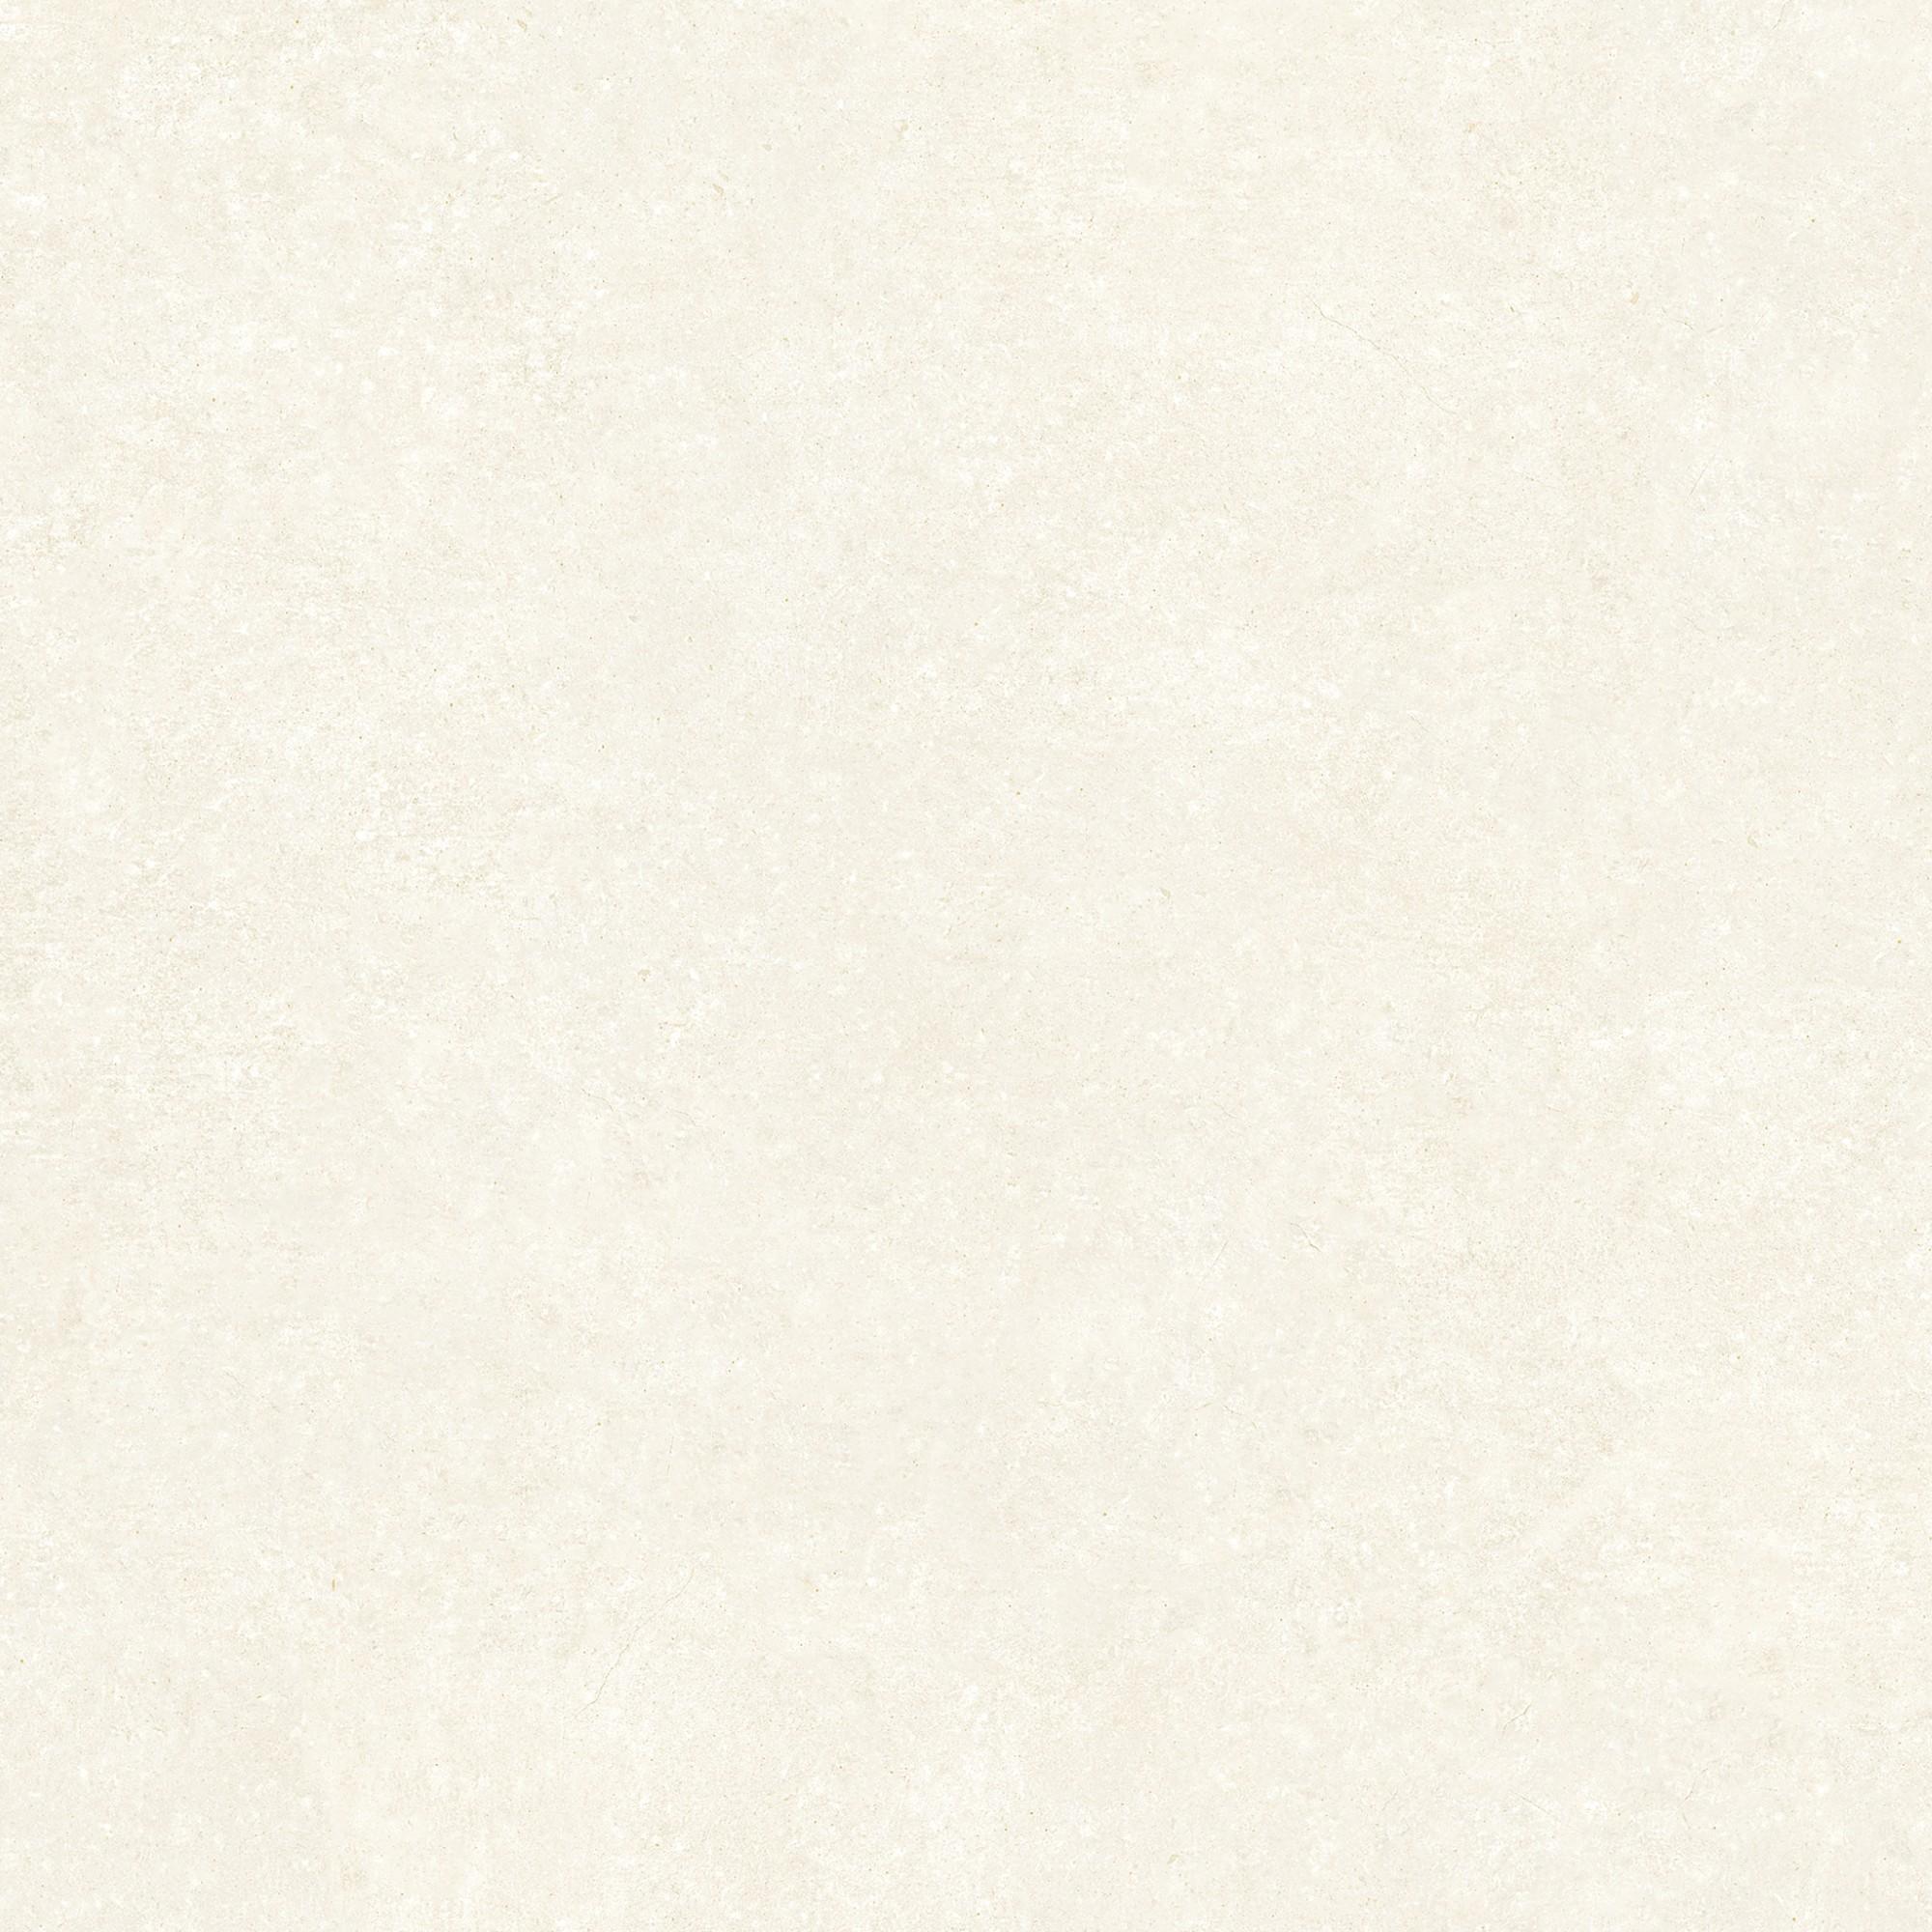 Ceramica Tipo A 62x62 cm Solarino Plus Esmaltado Brilhante - Carmelo Fior